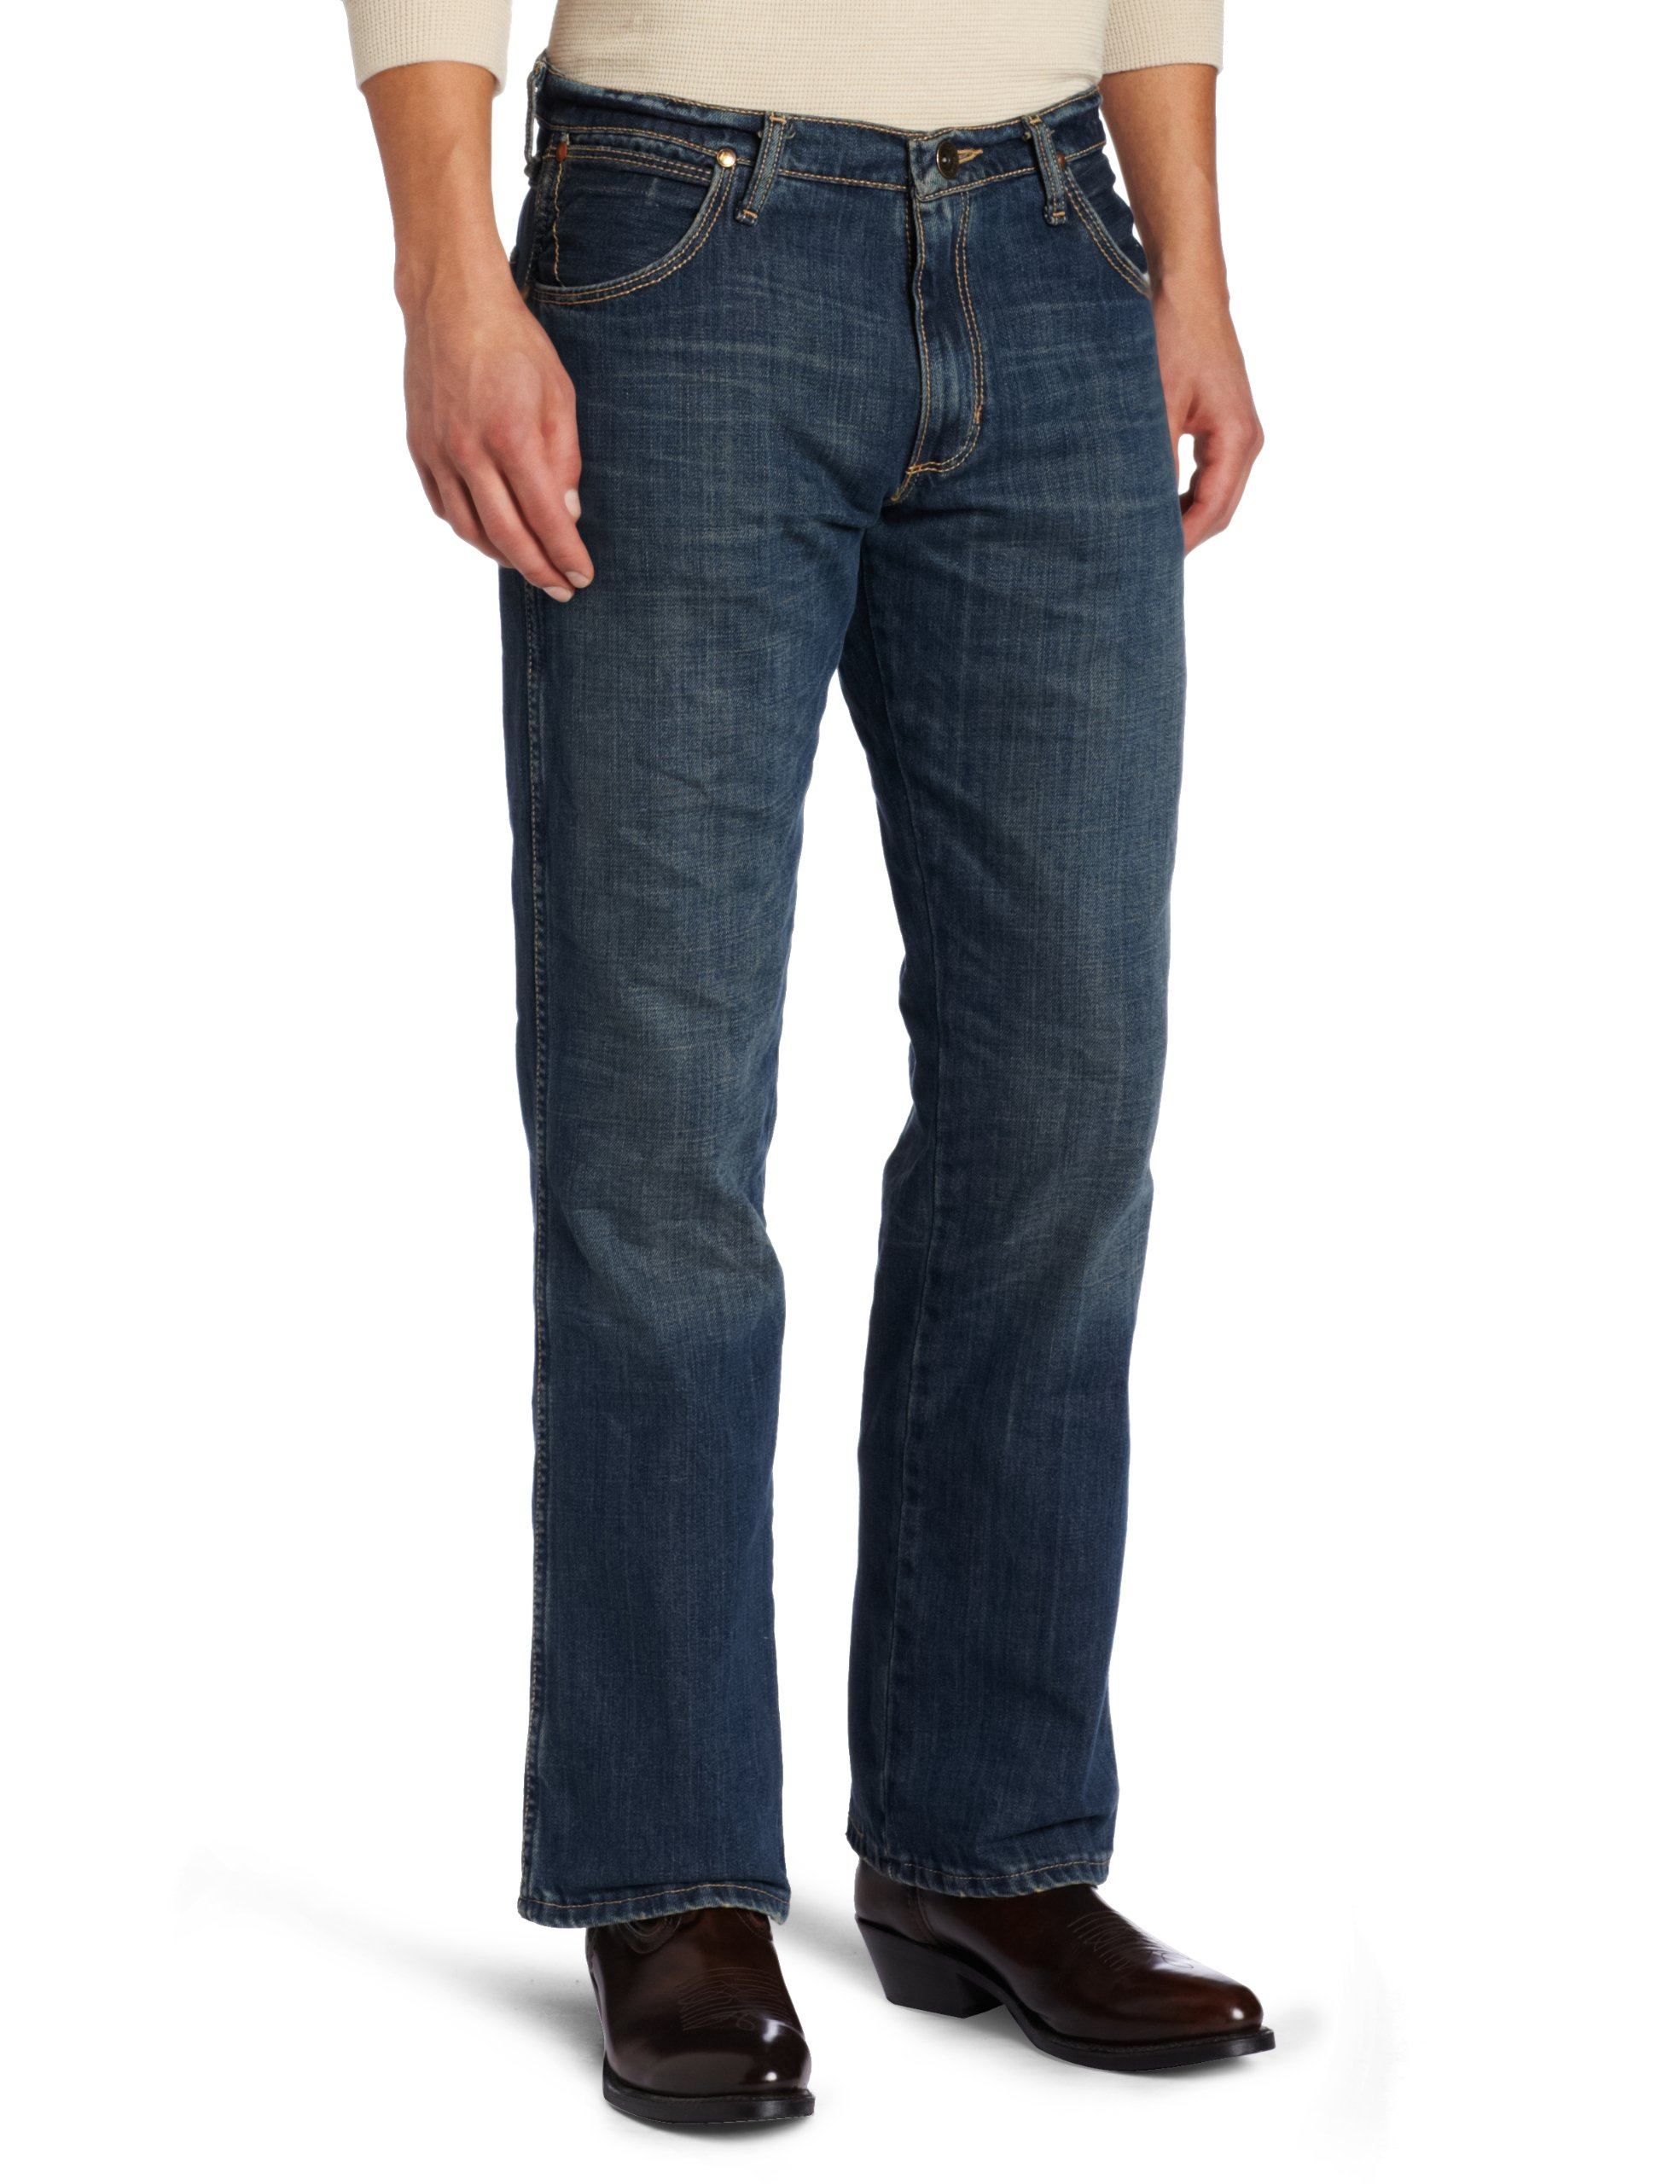 Wrangler Men's Tall Retro Slim Fit Boot Cut Jean Banjo Blue,Banjo Blue,36x38